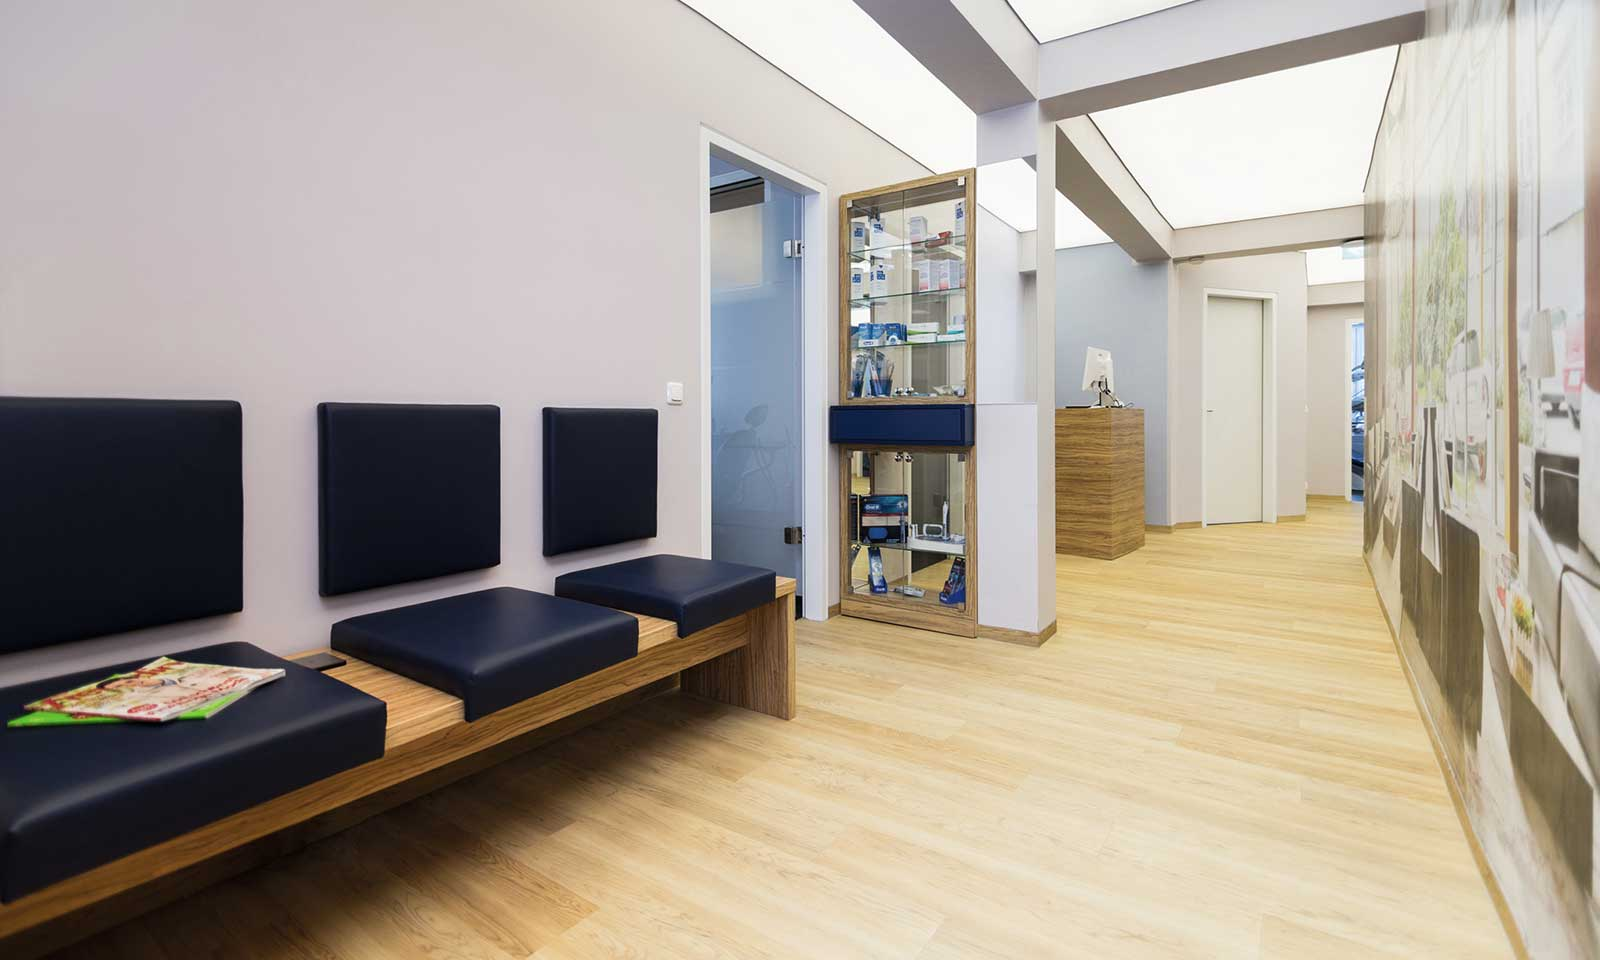 Tischlerei Praxen & Krankenhaus